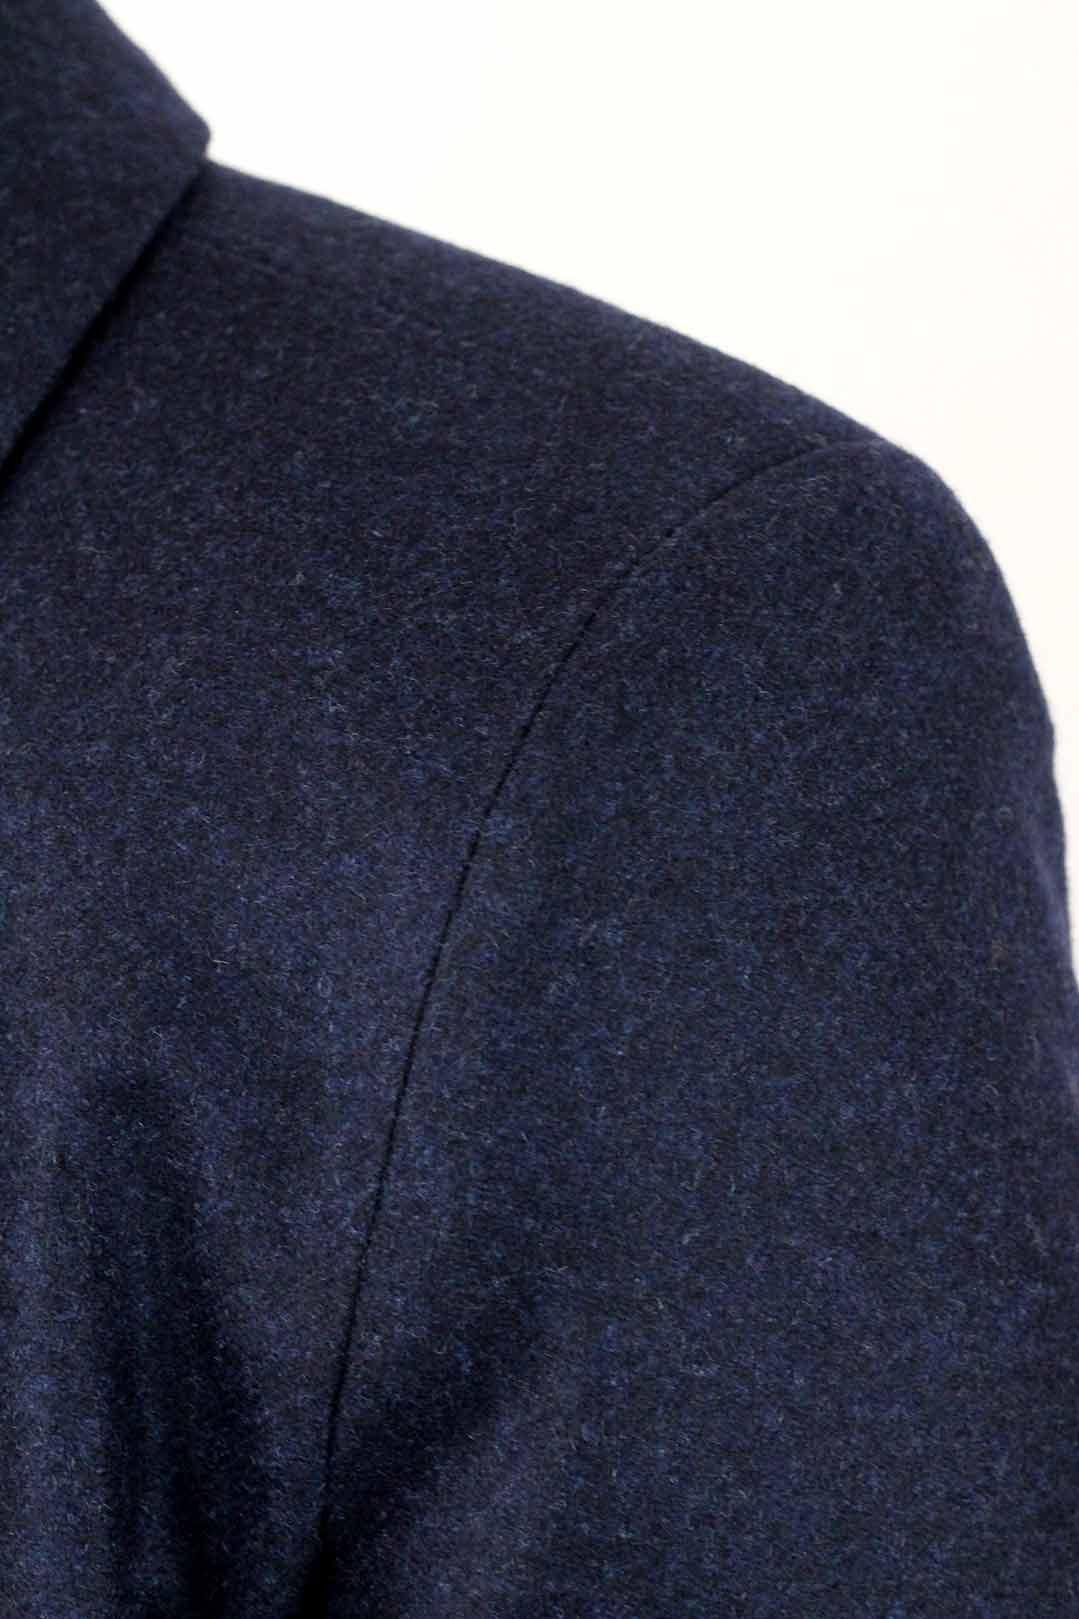 veste tailleur bleu marine femme